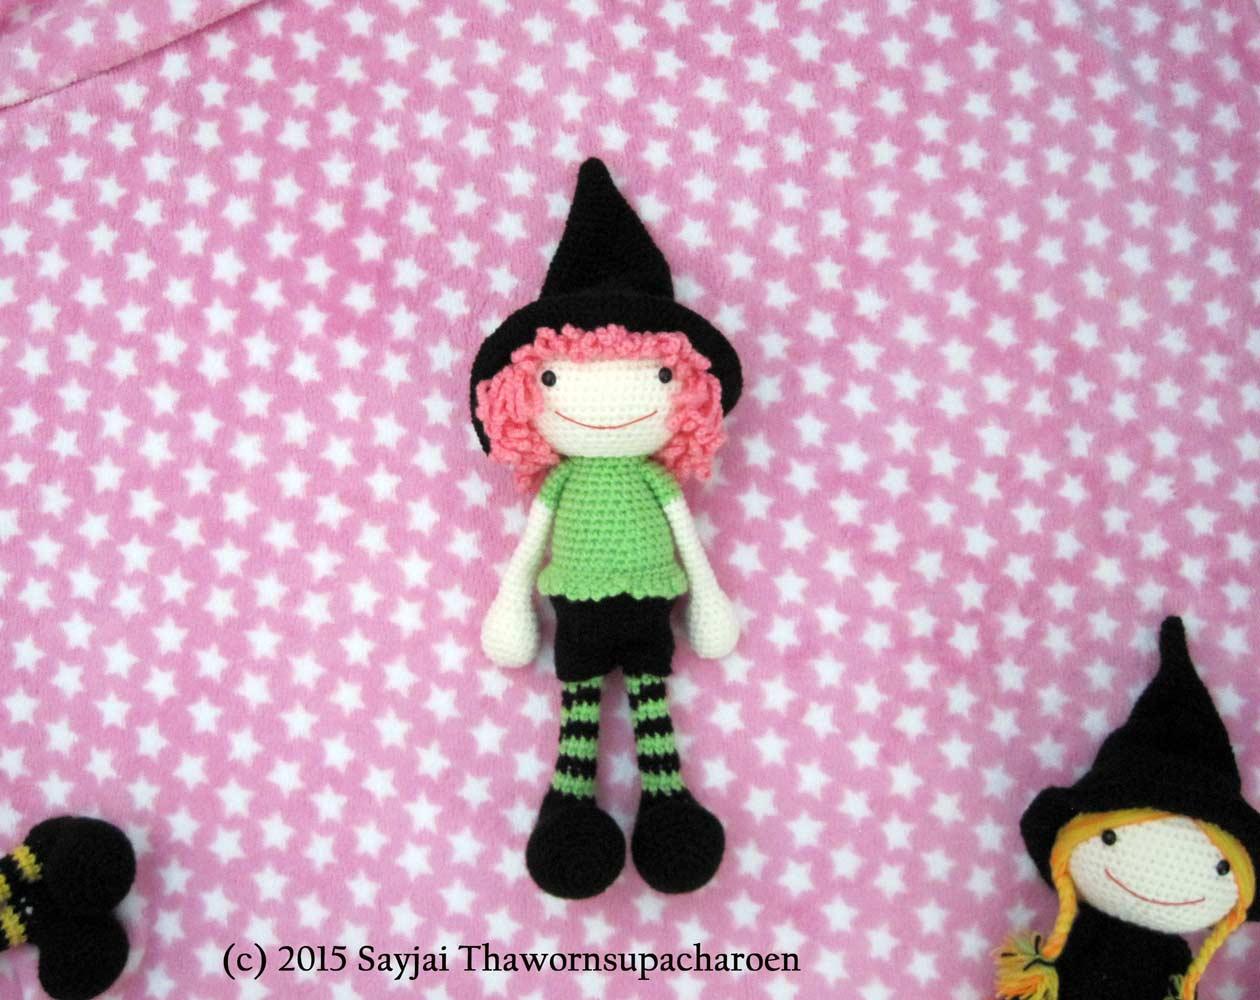 The 3 Witches Amigurumi Pattern - Sayjai Amigurumi Crochet ... | 1000x1260